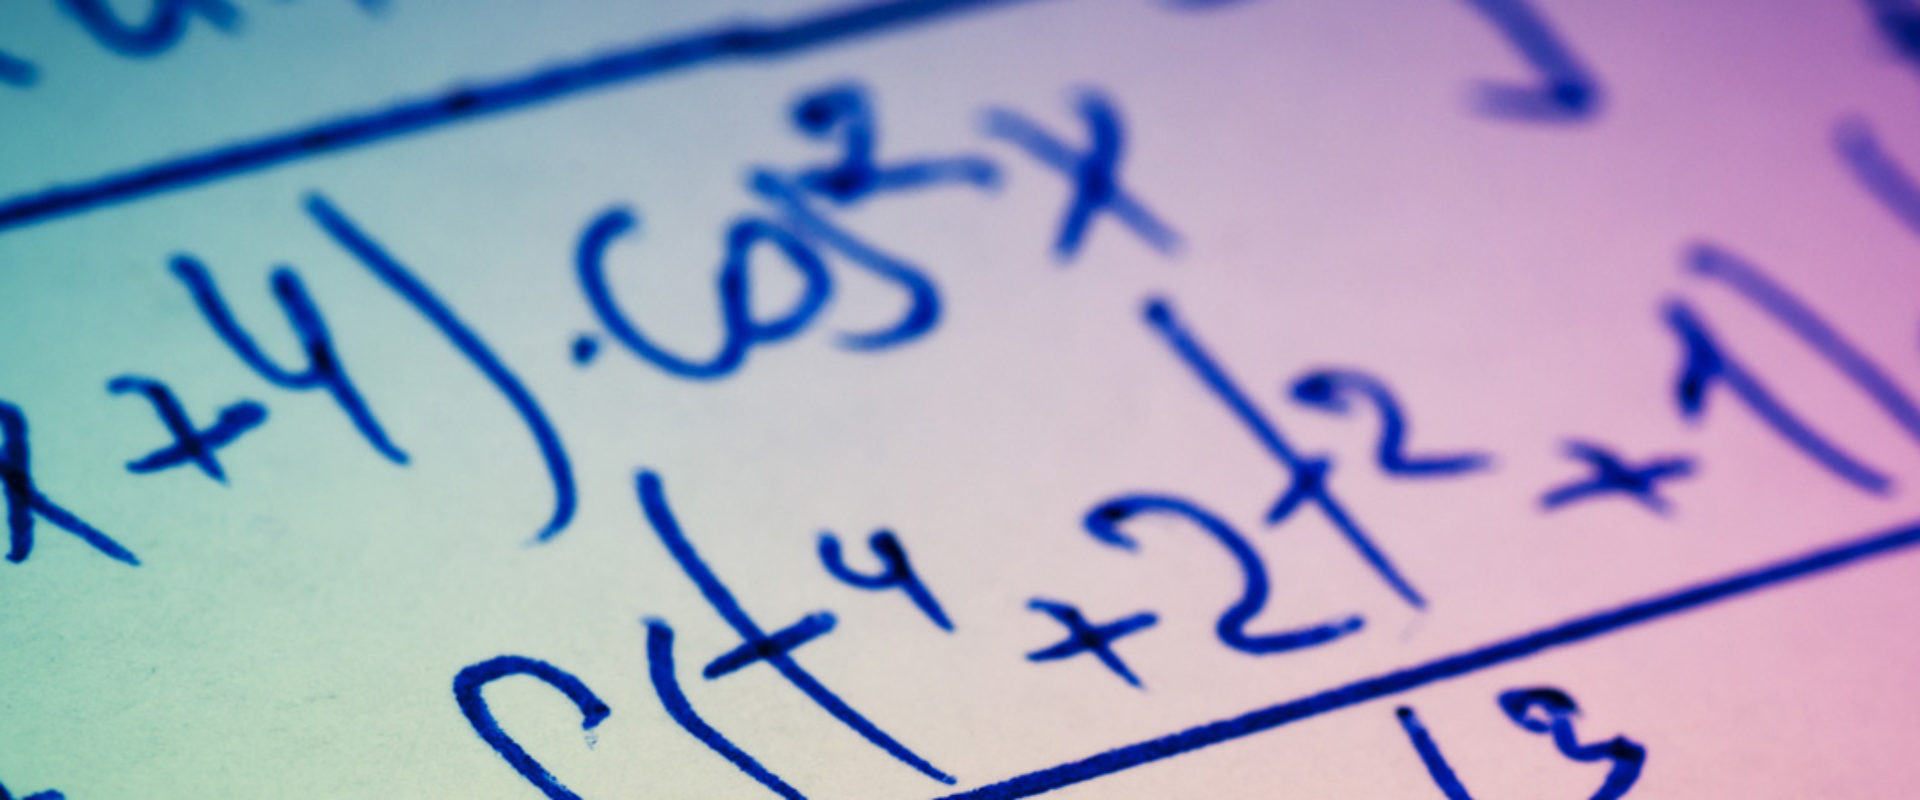 Mr. Ghassemian's Math